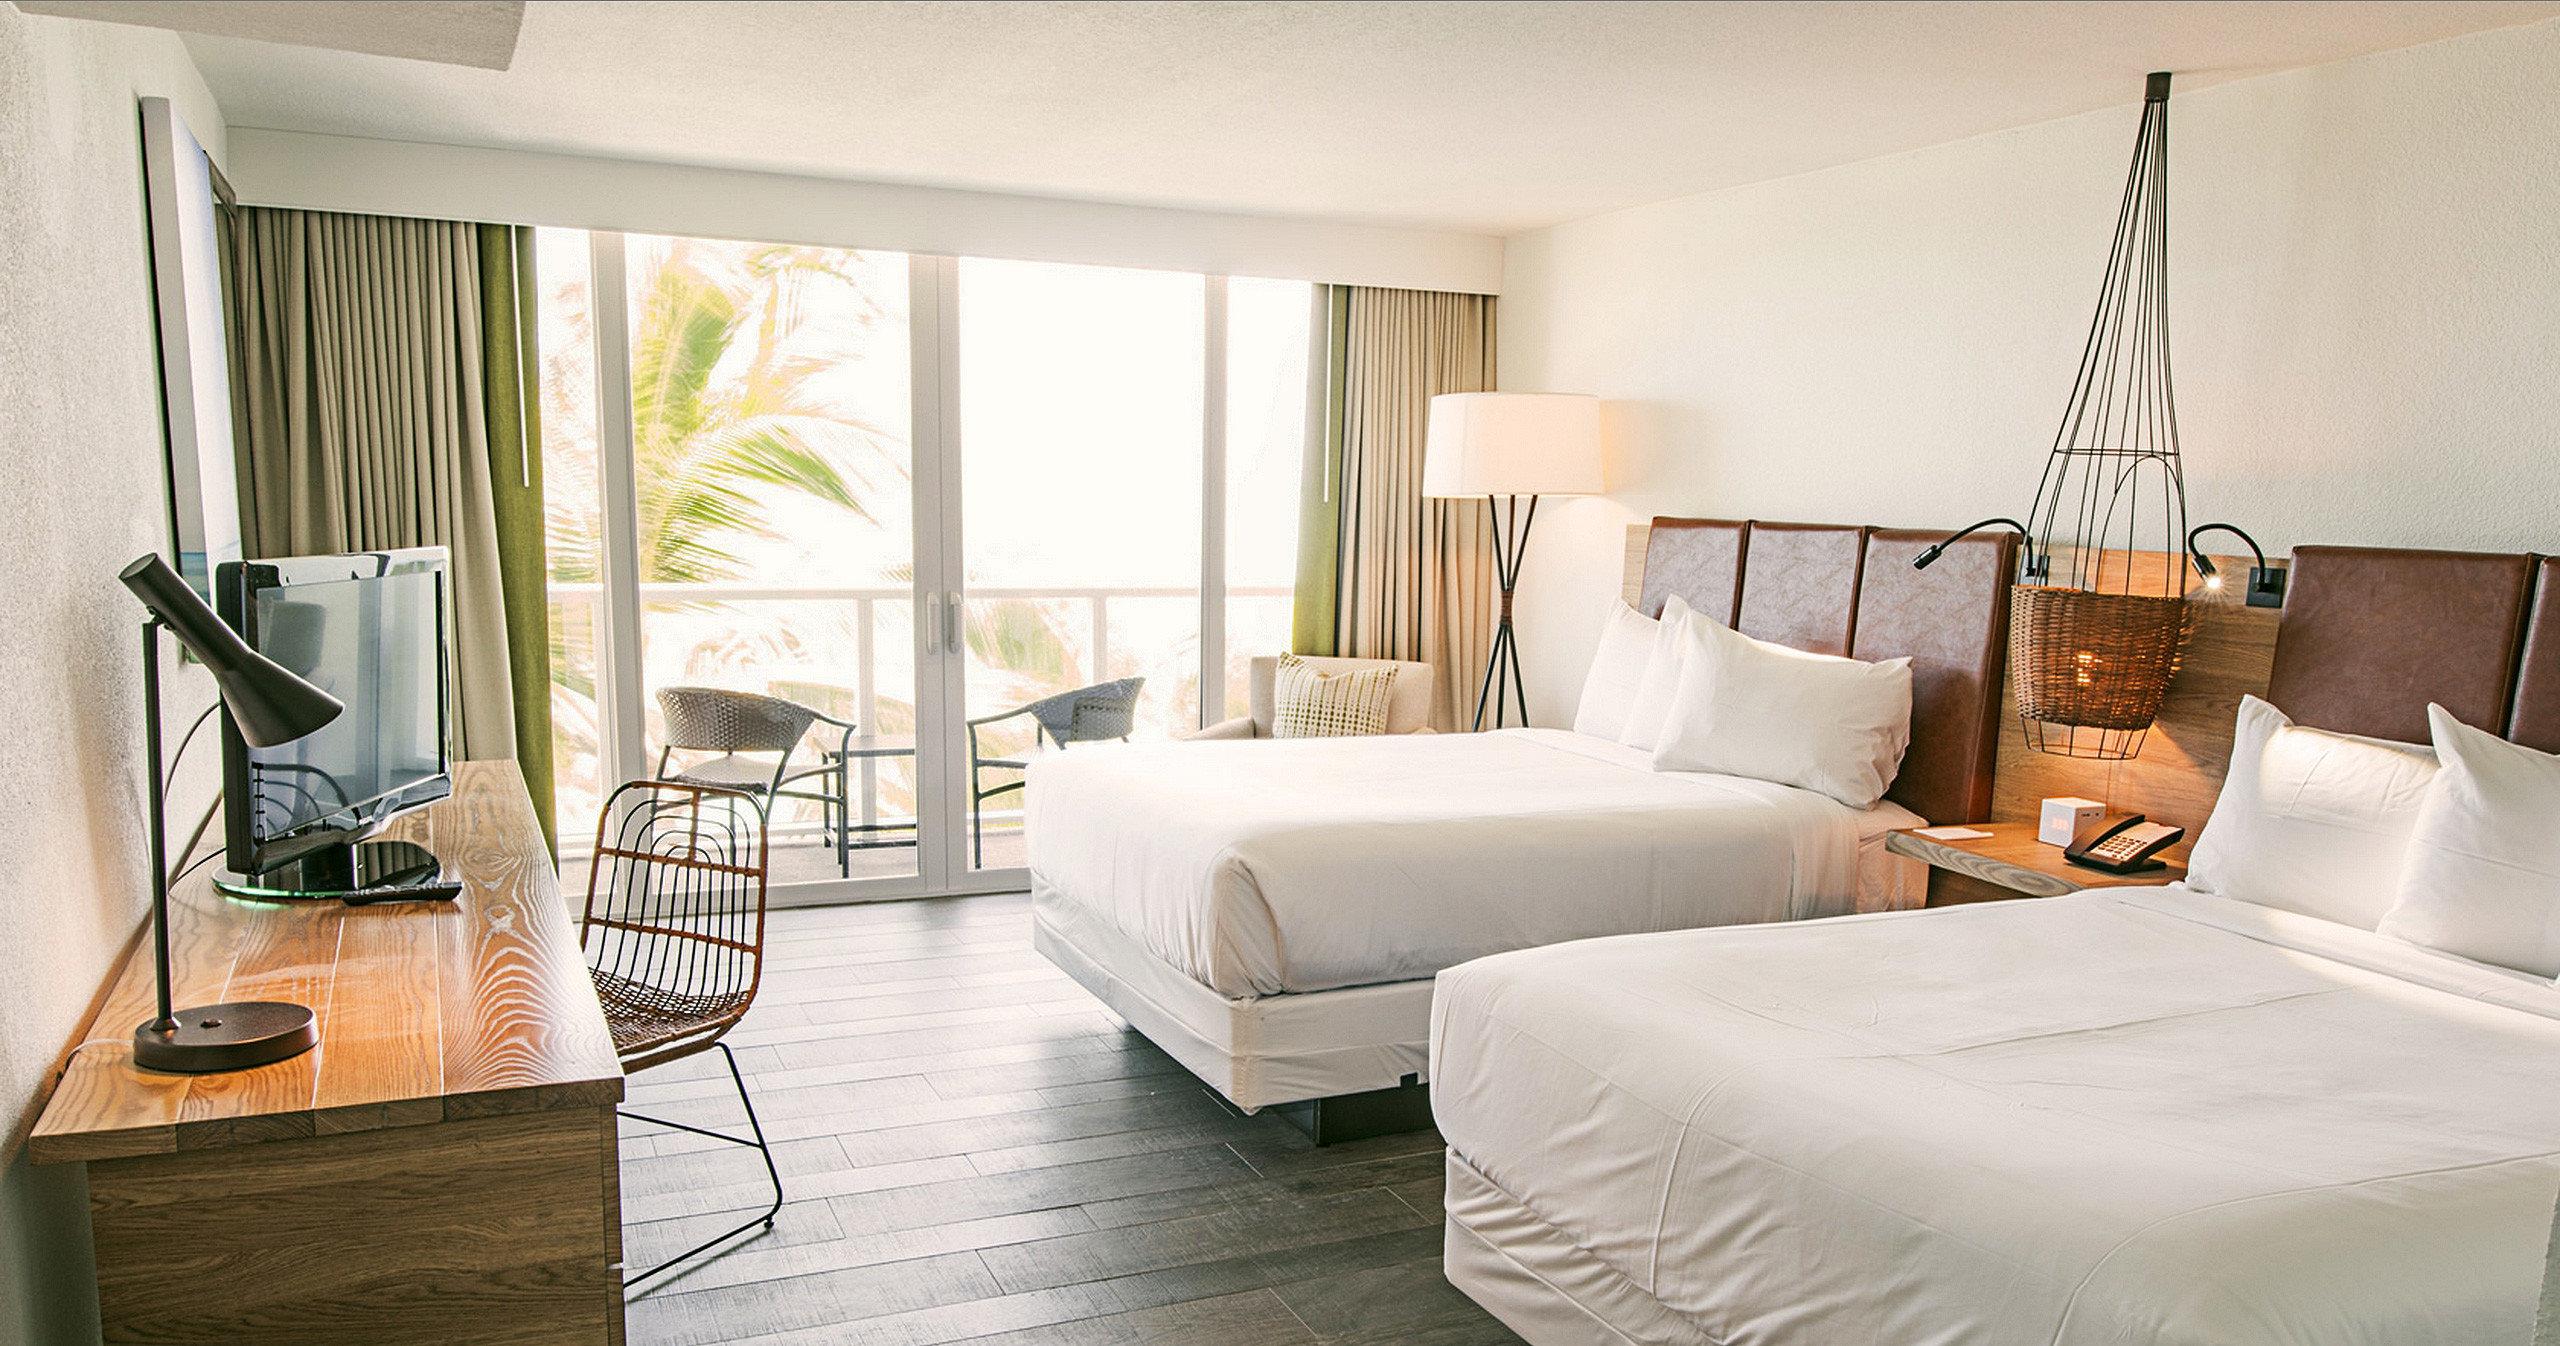 Beach Beachfront Bedroom Hotels Resort property living room home Suite condominium cottage Villa